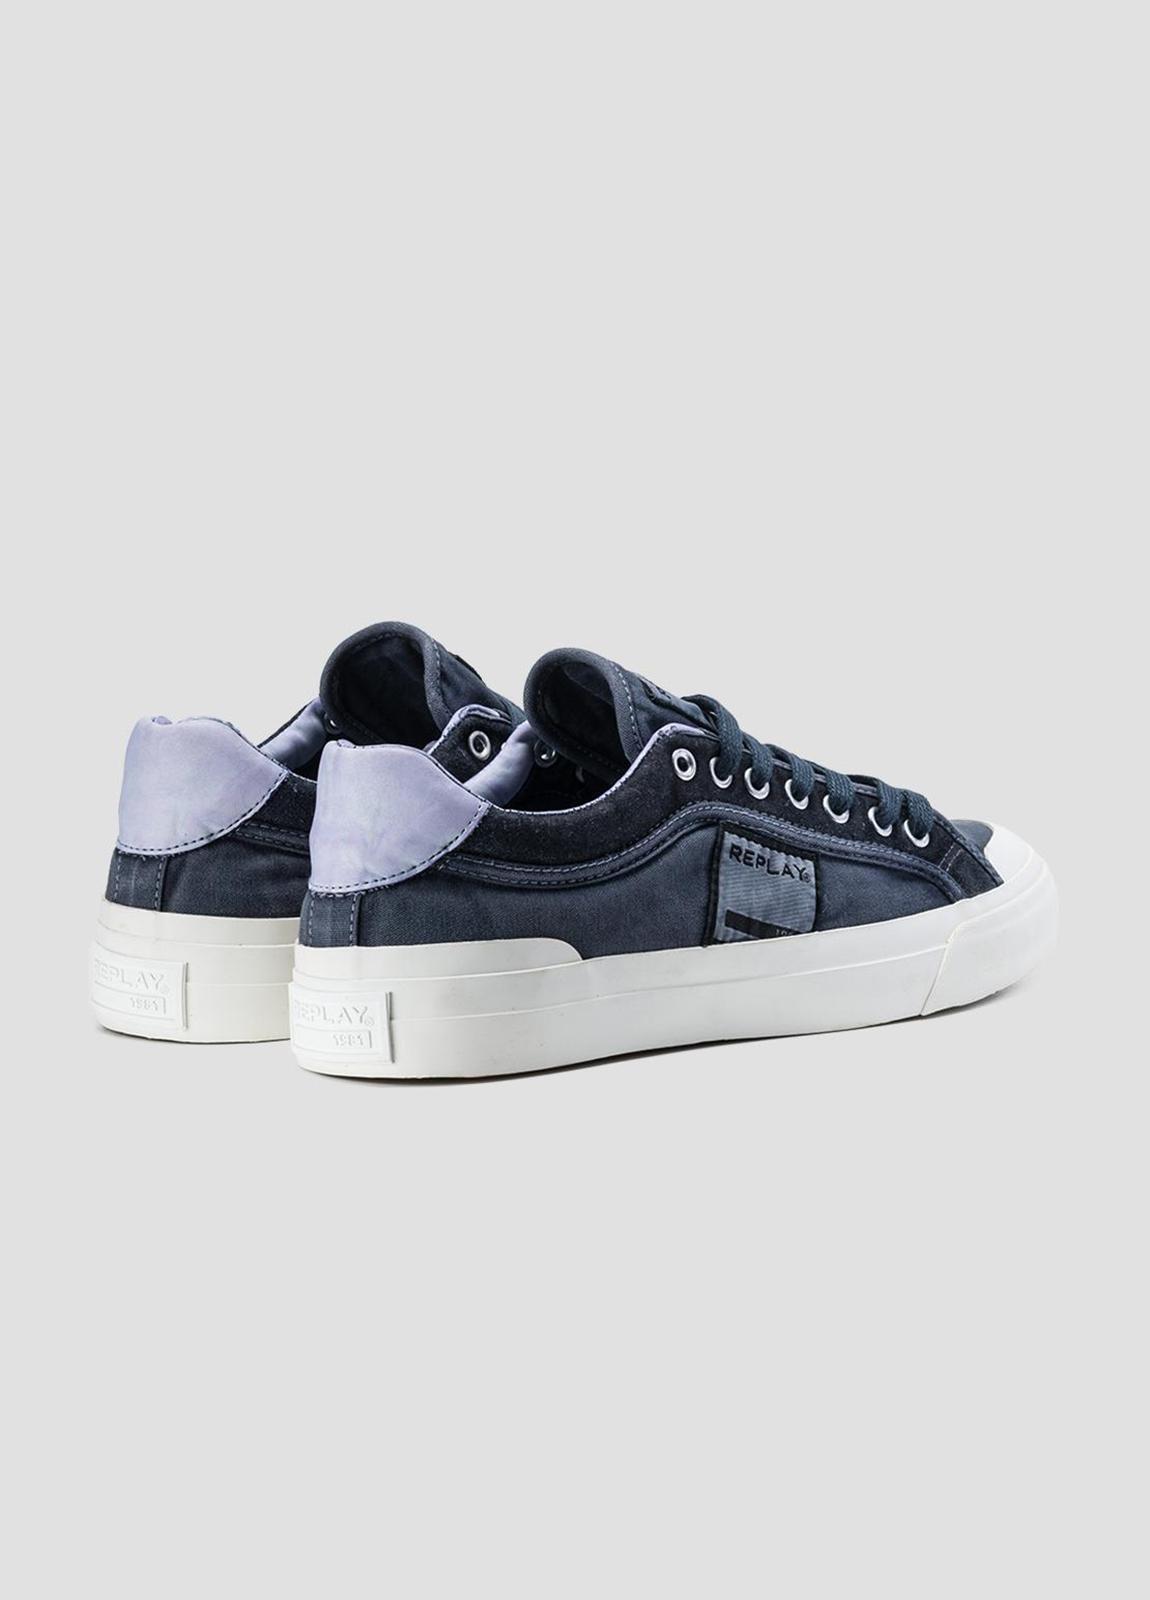 Calzado sport modelo DAWSON con cordones color azul marino. 100% Algodón. - Ítem2